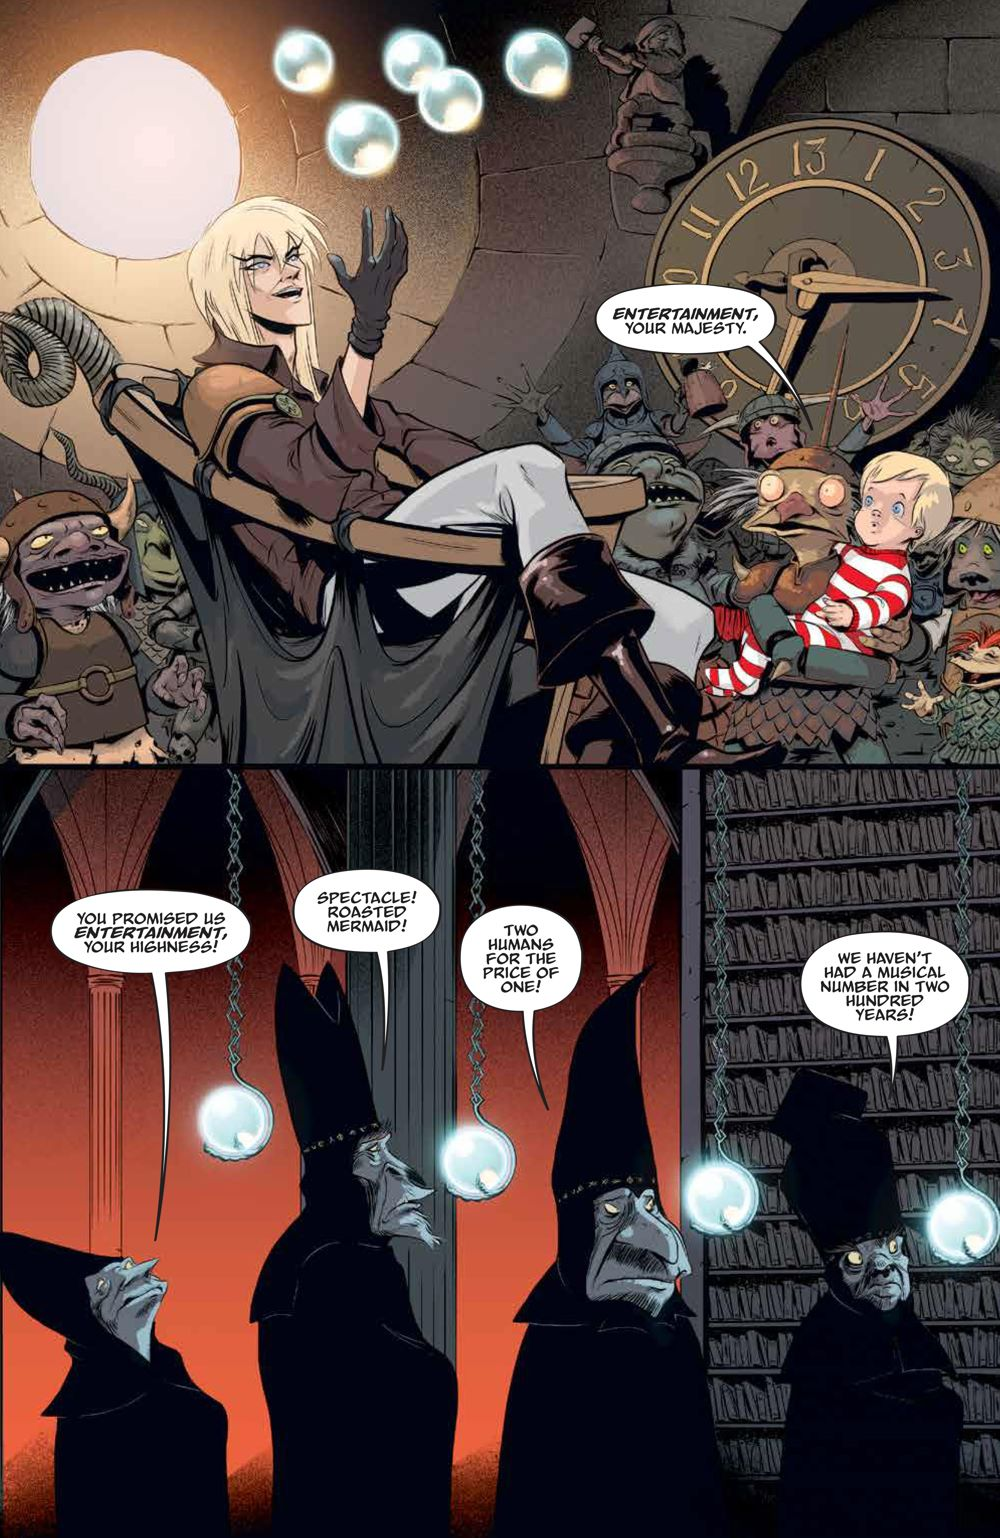 LabyrinthCoronation_v2_SC_PRESS_10 ComicList Previews: JIM HENSON'S LABYRINTH CORONATION VOLUME 2 TP